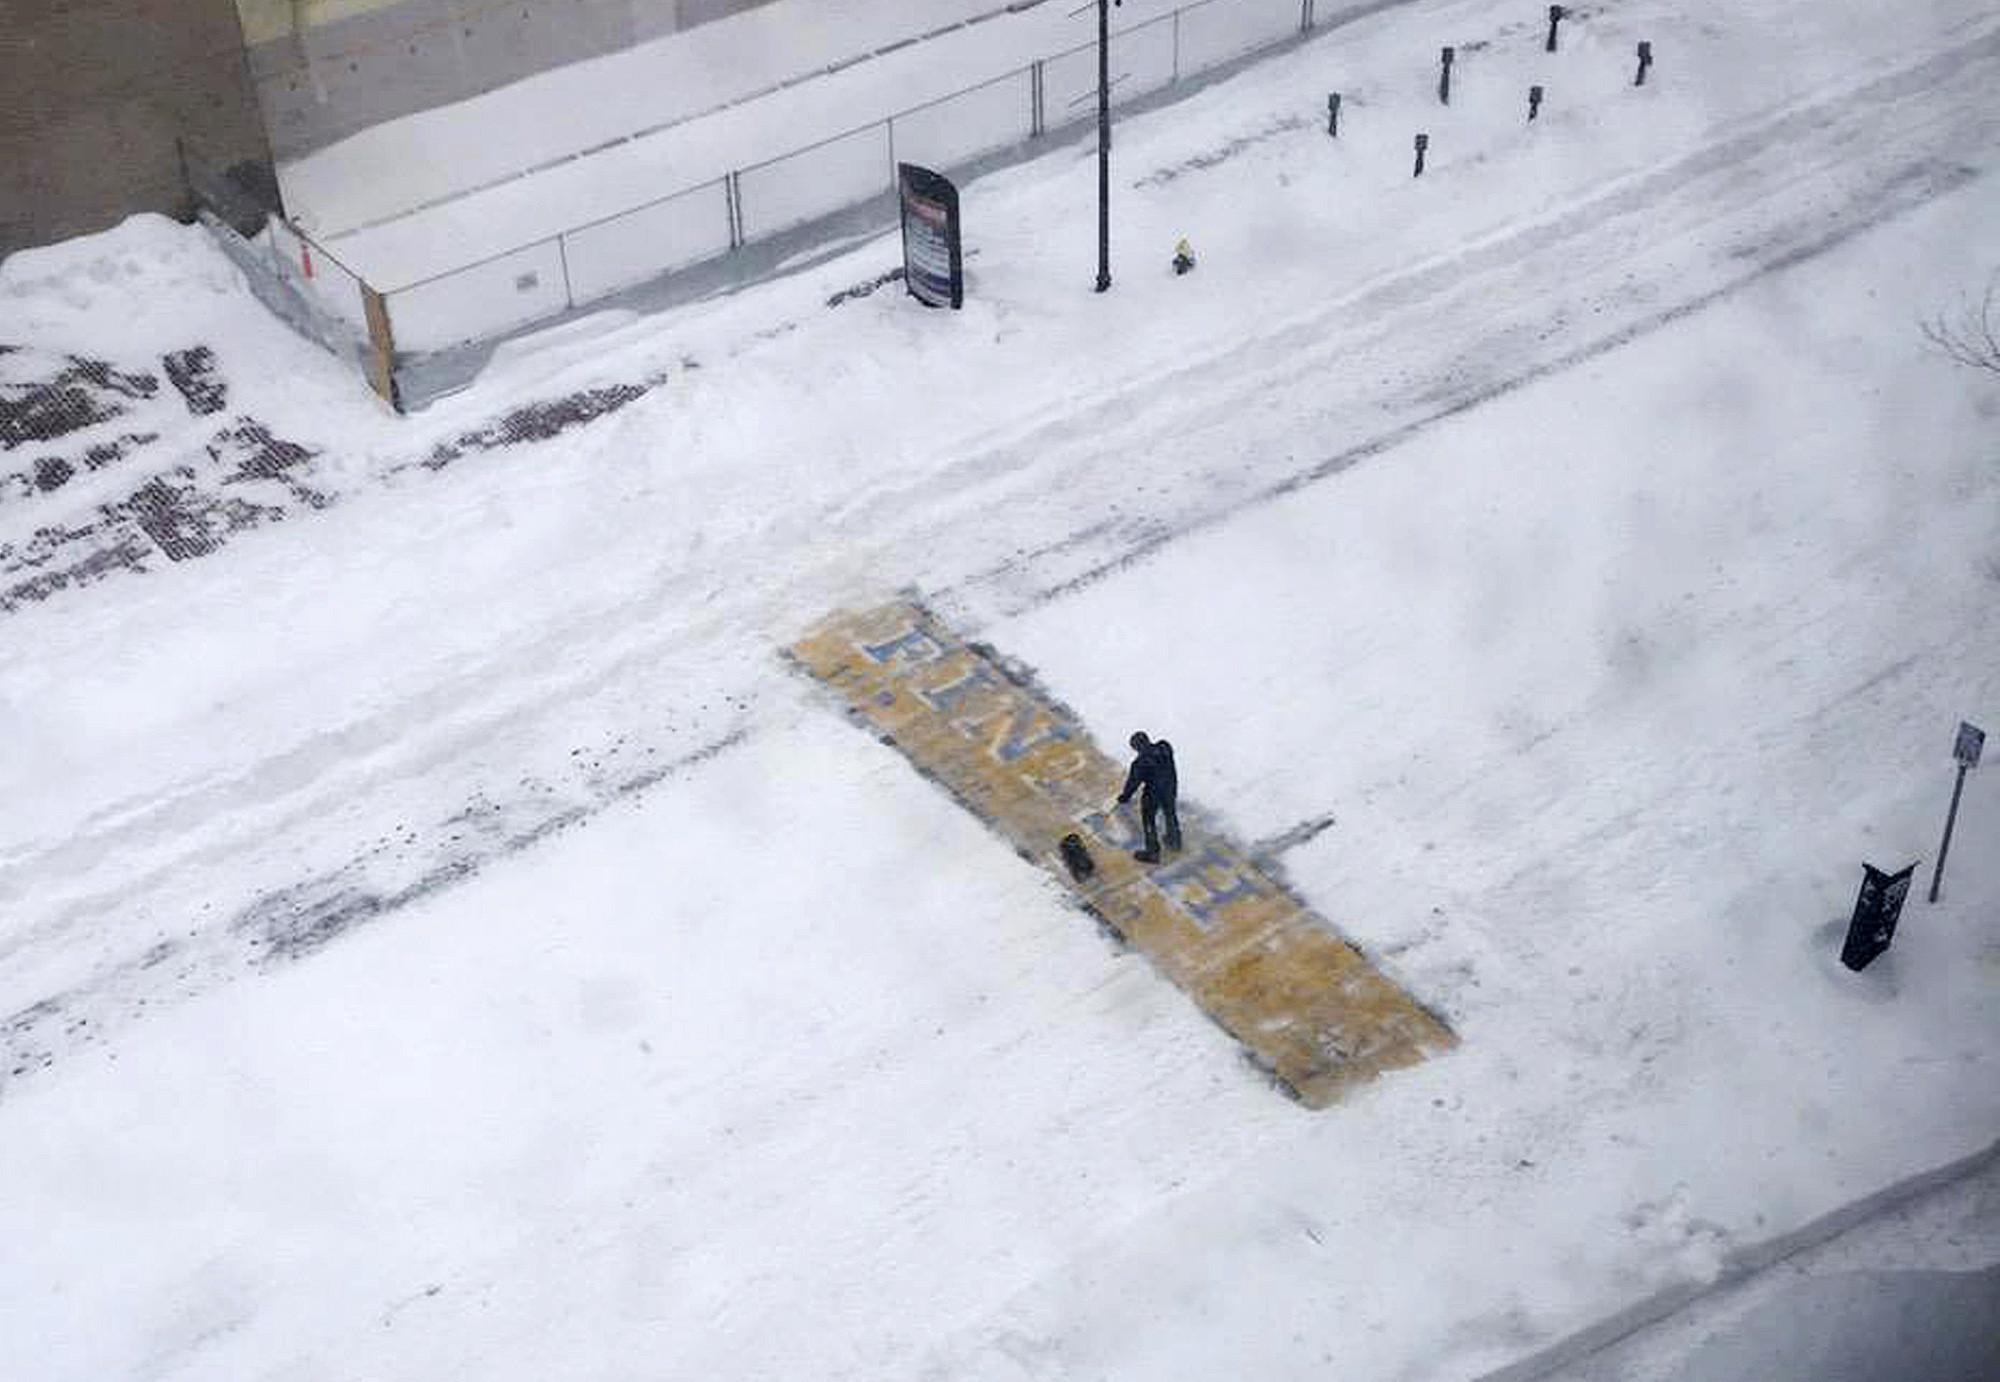 Man who shoveled snow from Boston Marathon finish line identified